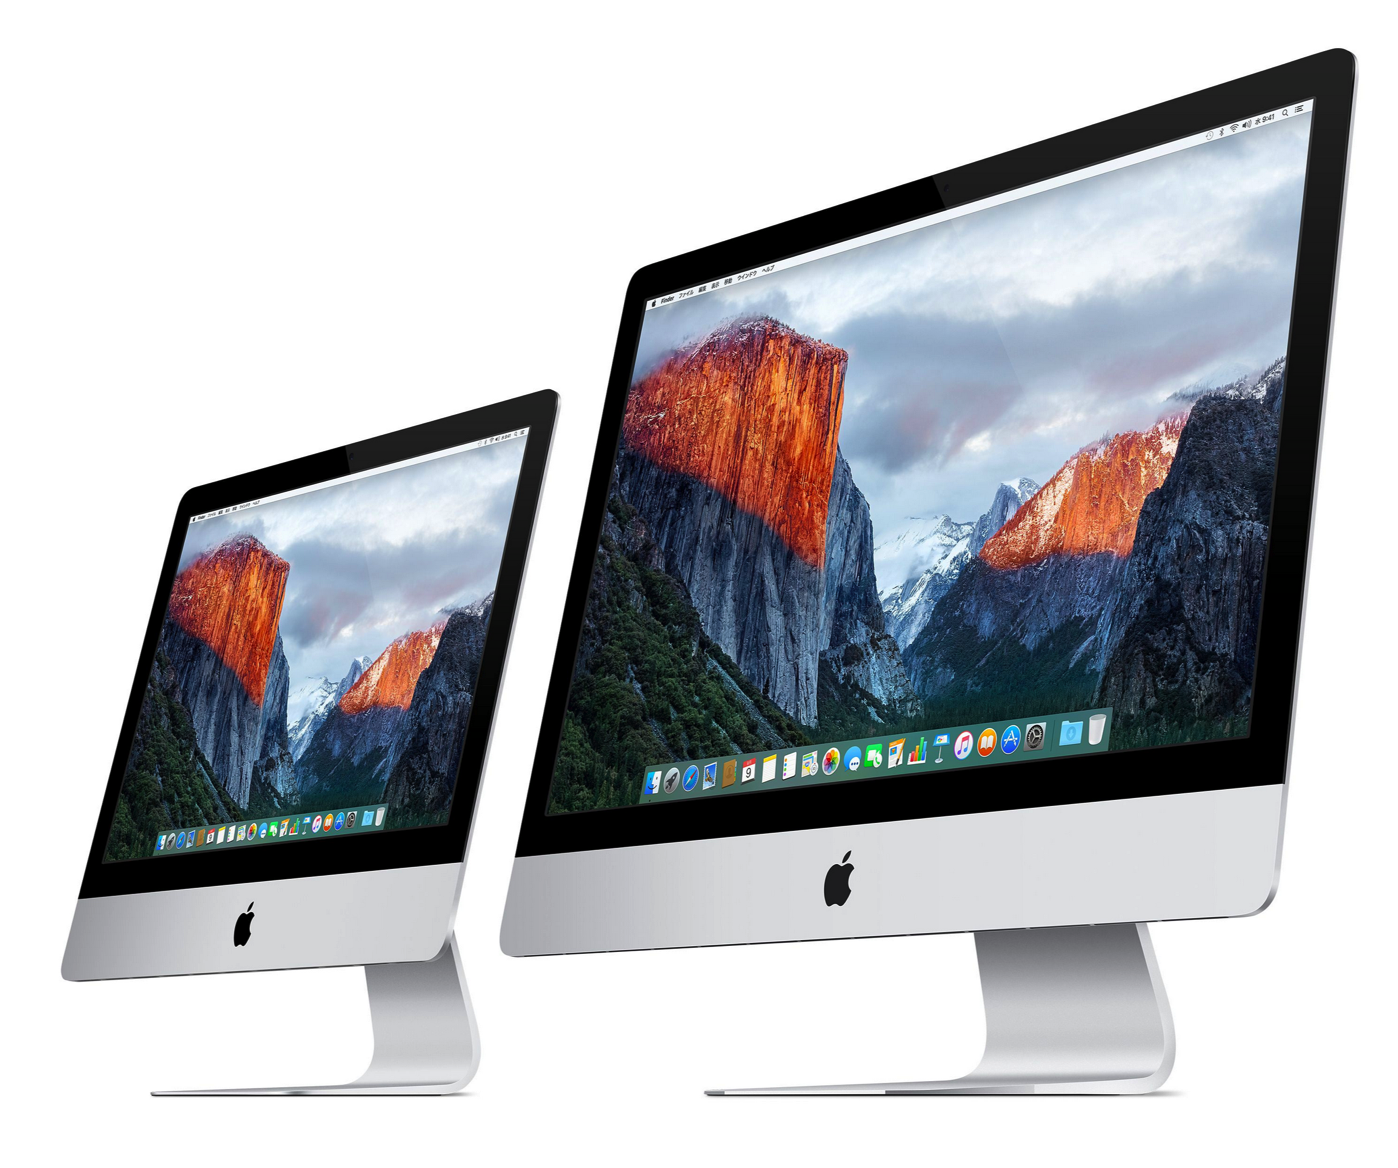 [iMac]ついに登場!21.5インチ型「iMac 4K Retinaディスプレイモデル」 27インチも刷新!